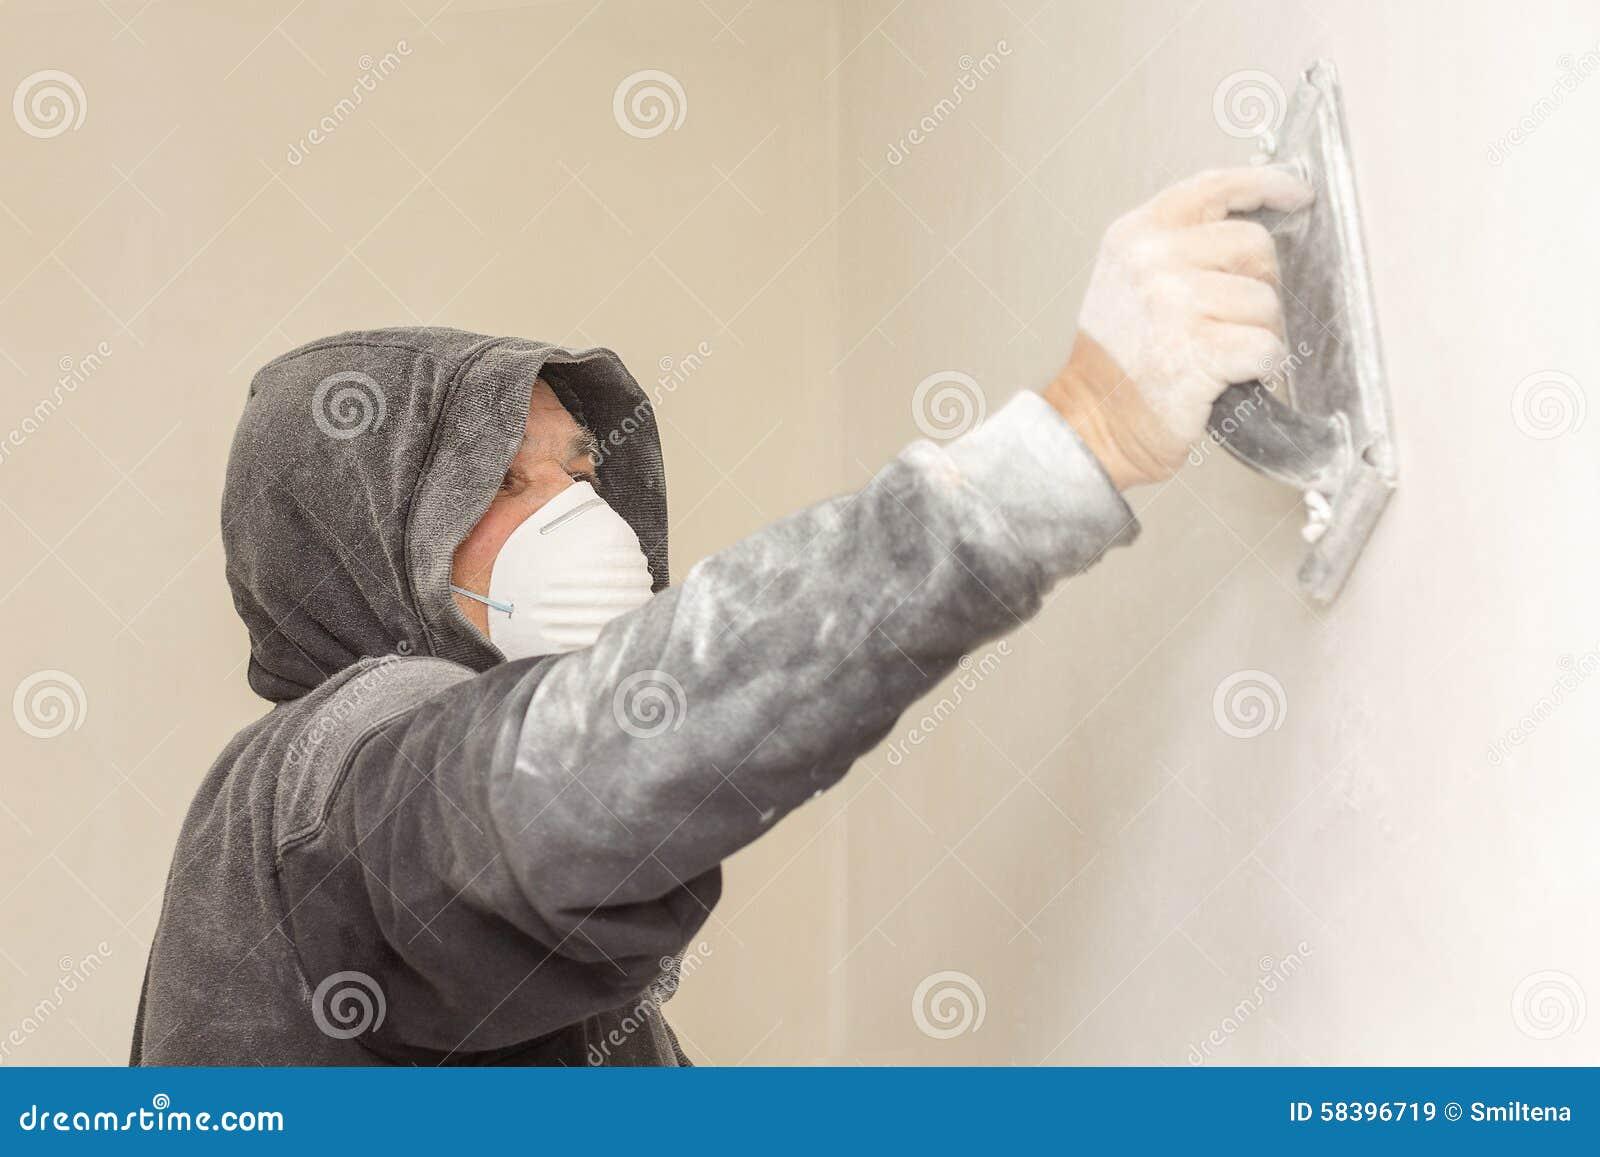 Man Renovating His House Alone. Royalty Free Stock Photo